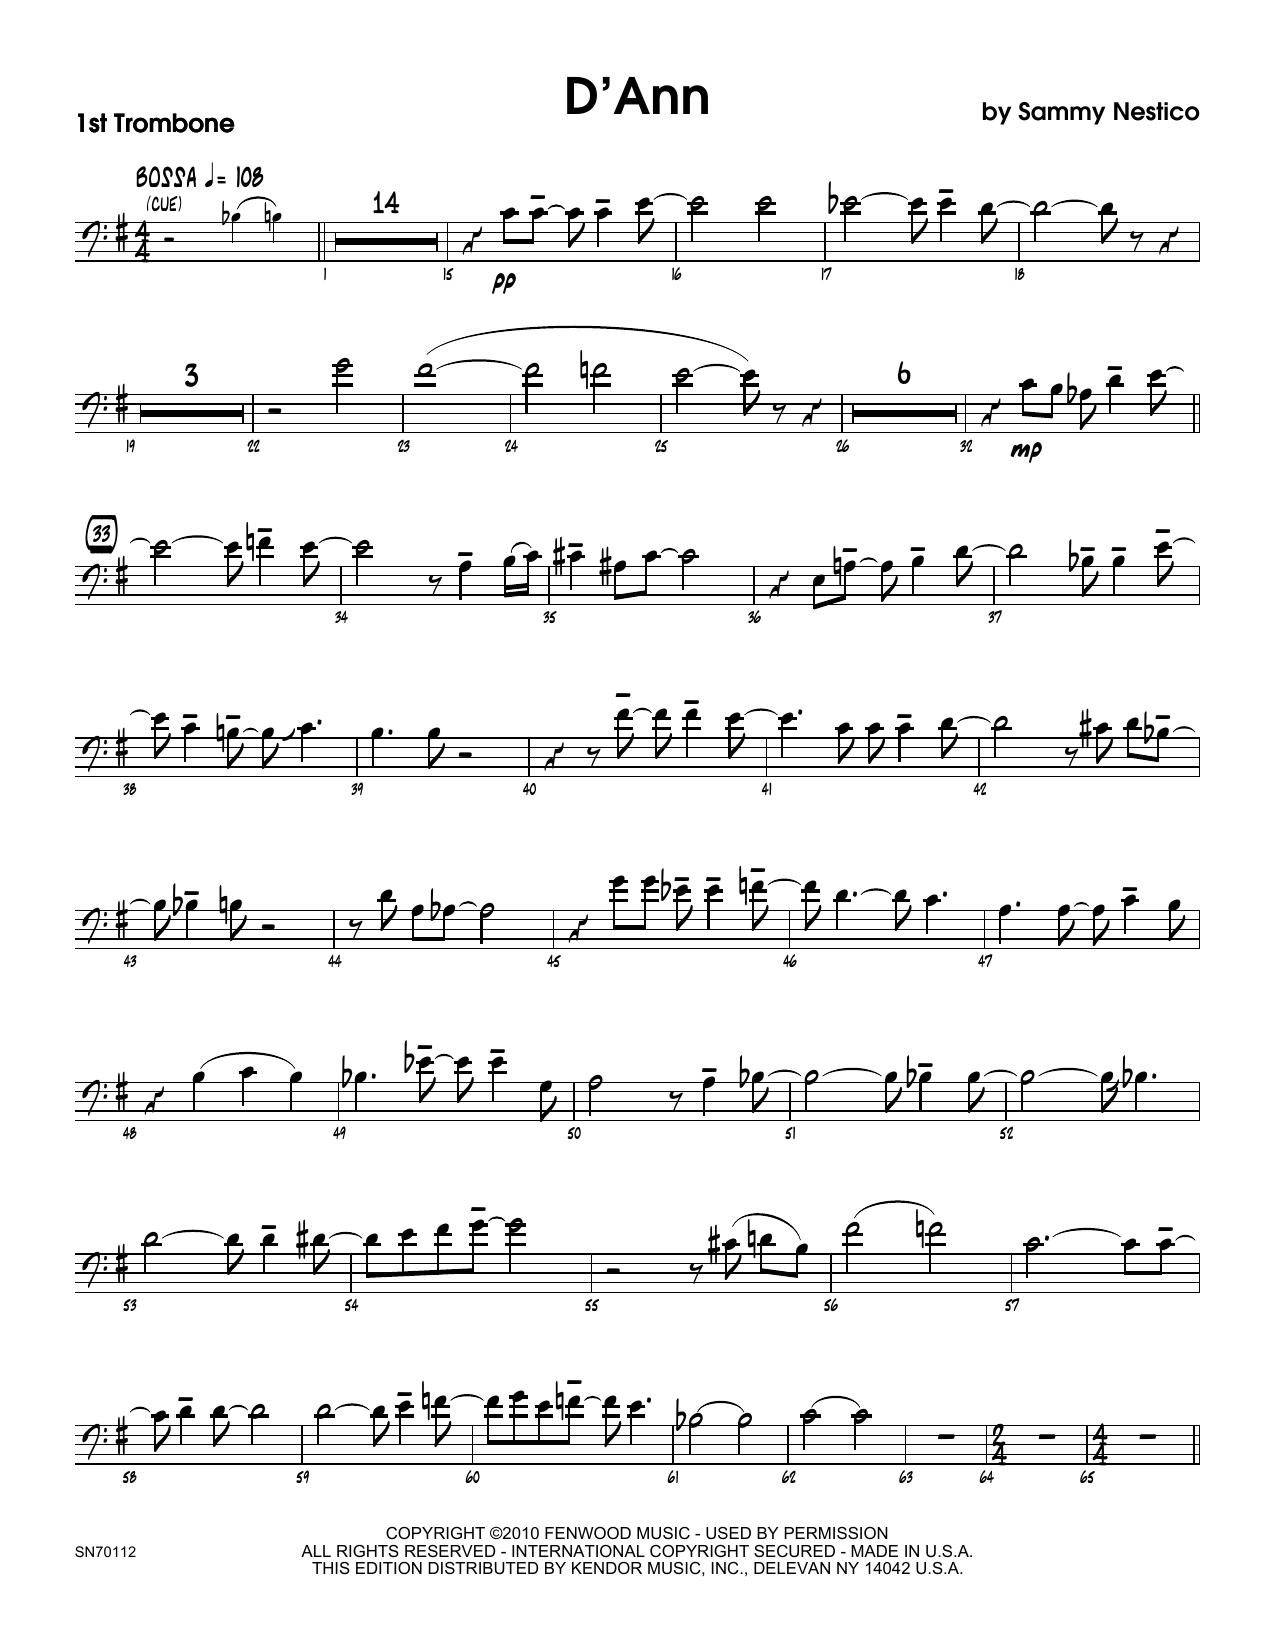 Sammy Nestico - D'Ann - 1st Trombone